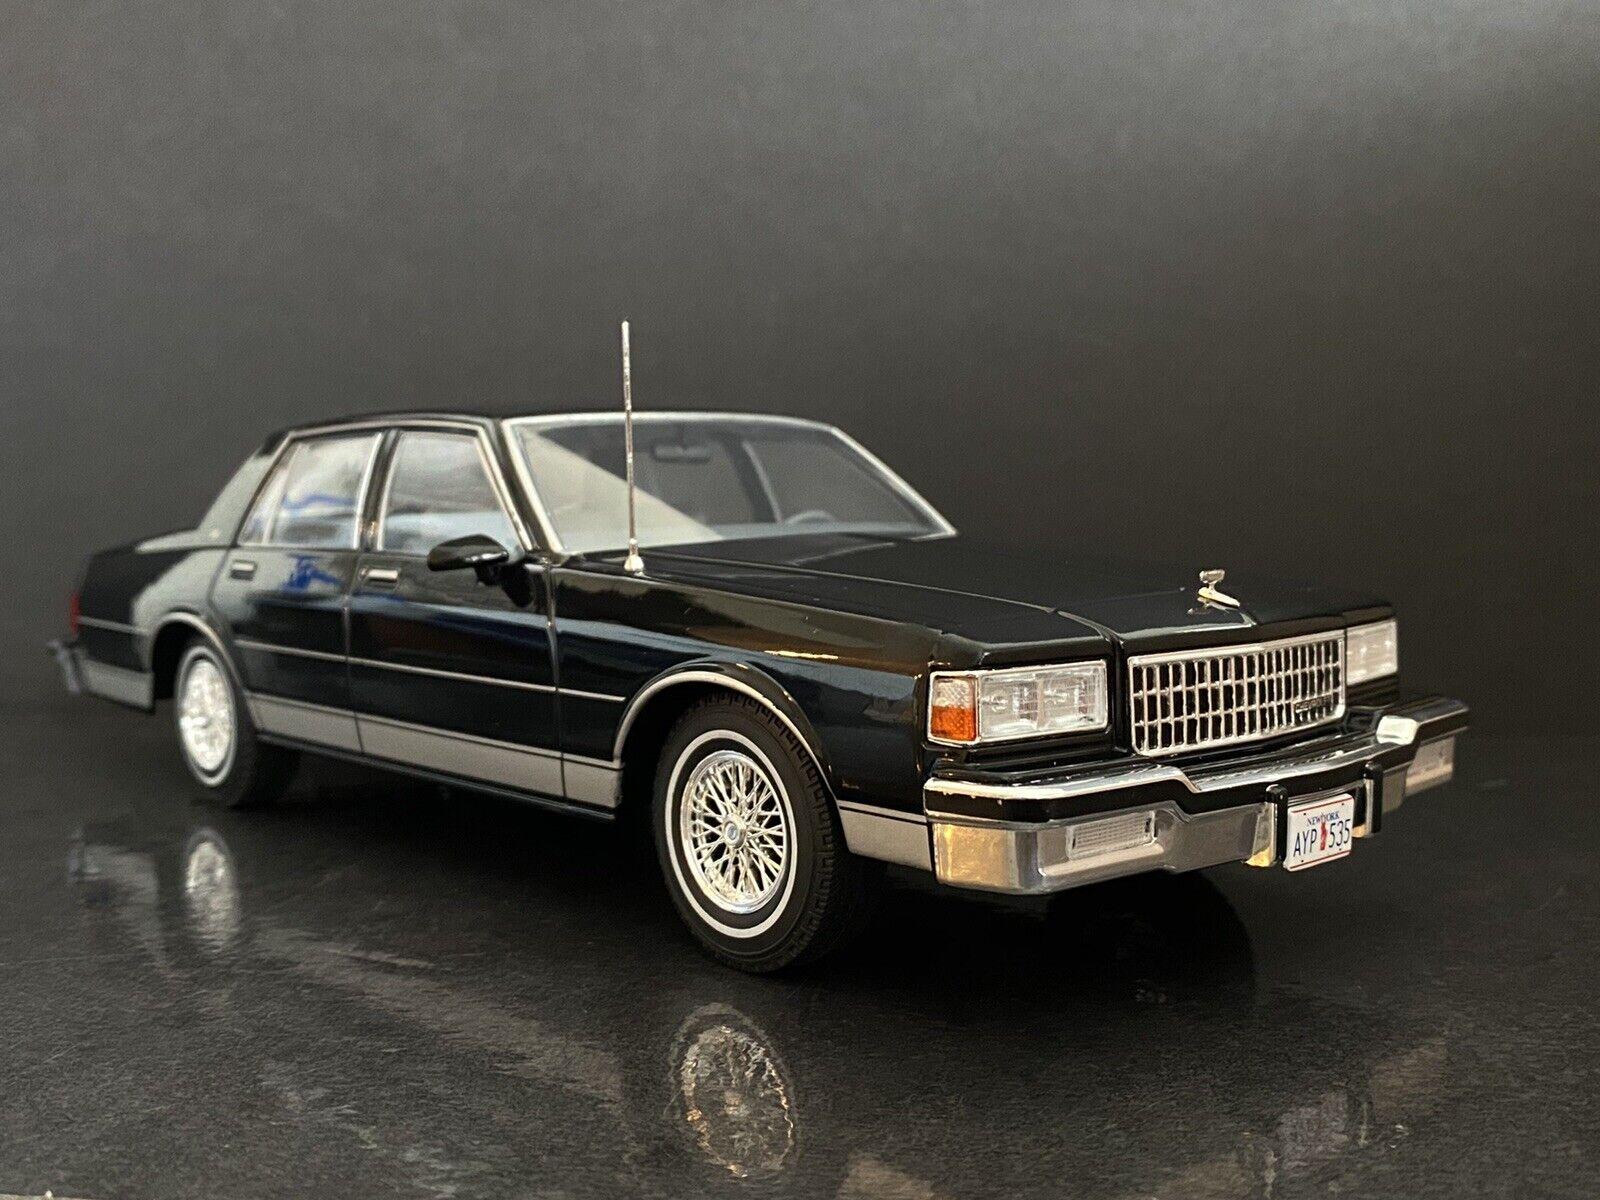 chevrolet caprice classic sedan police 1985 mcg 18039 1 18 for sale online ebay 1985 chevrolet caprice classic black mcg 1 18 htf 1 of 200 made